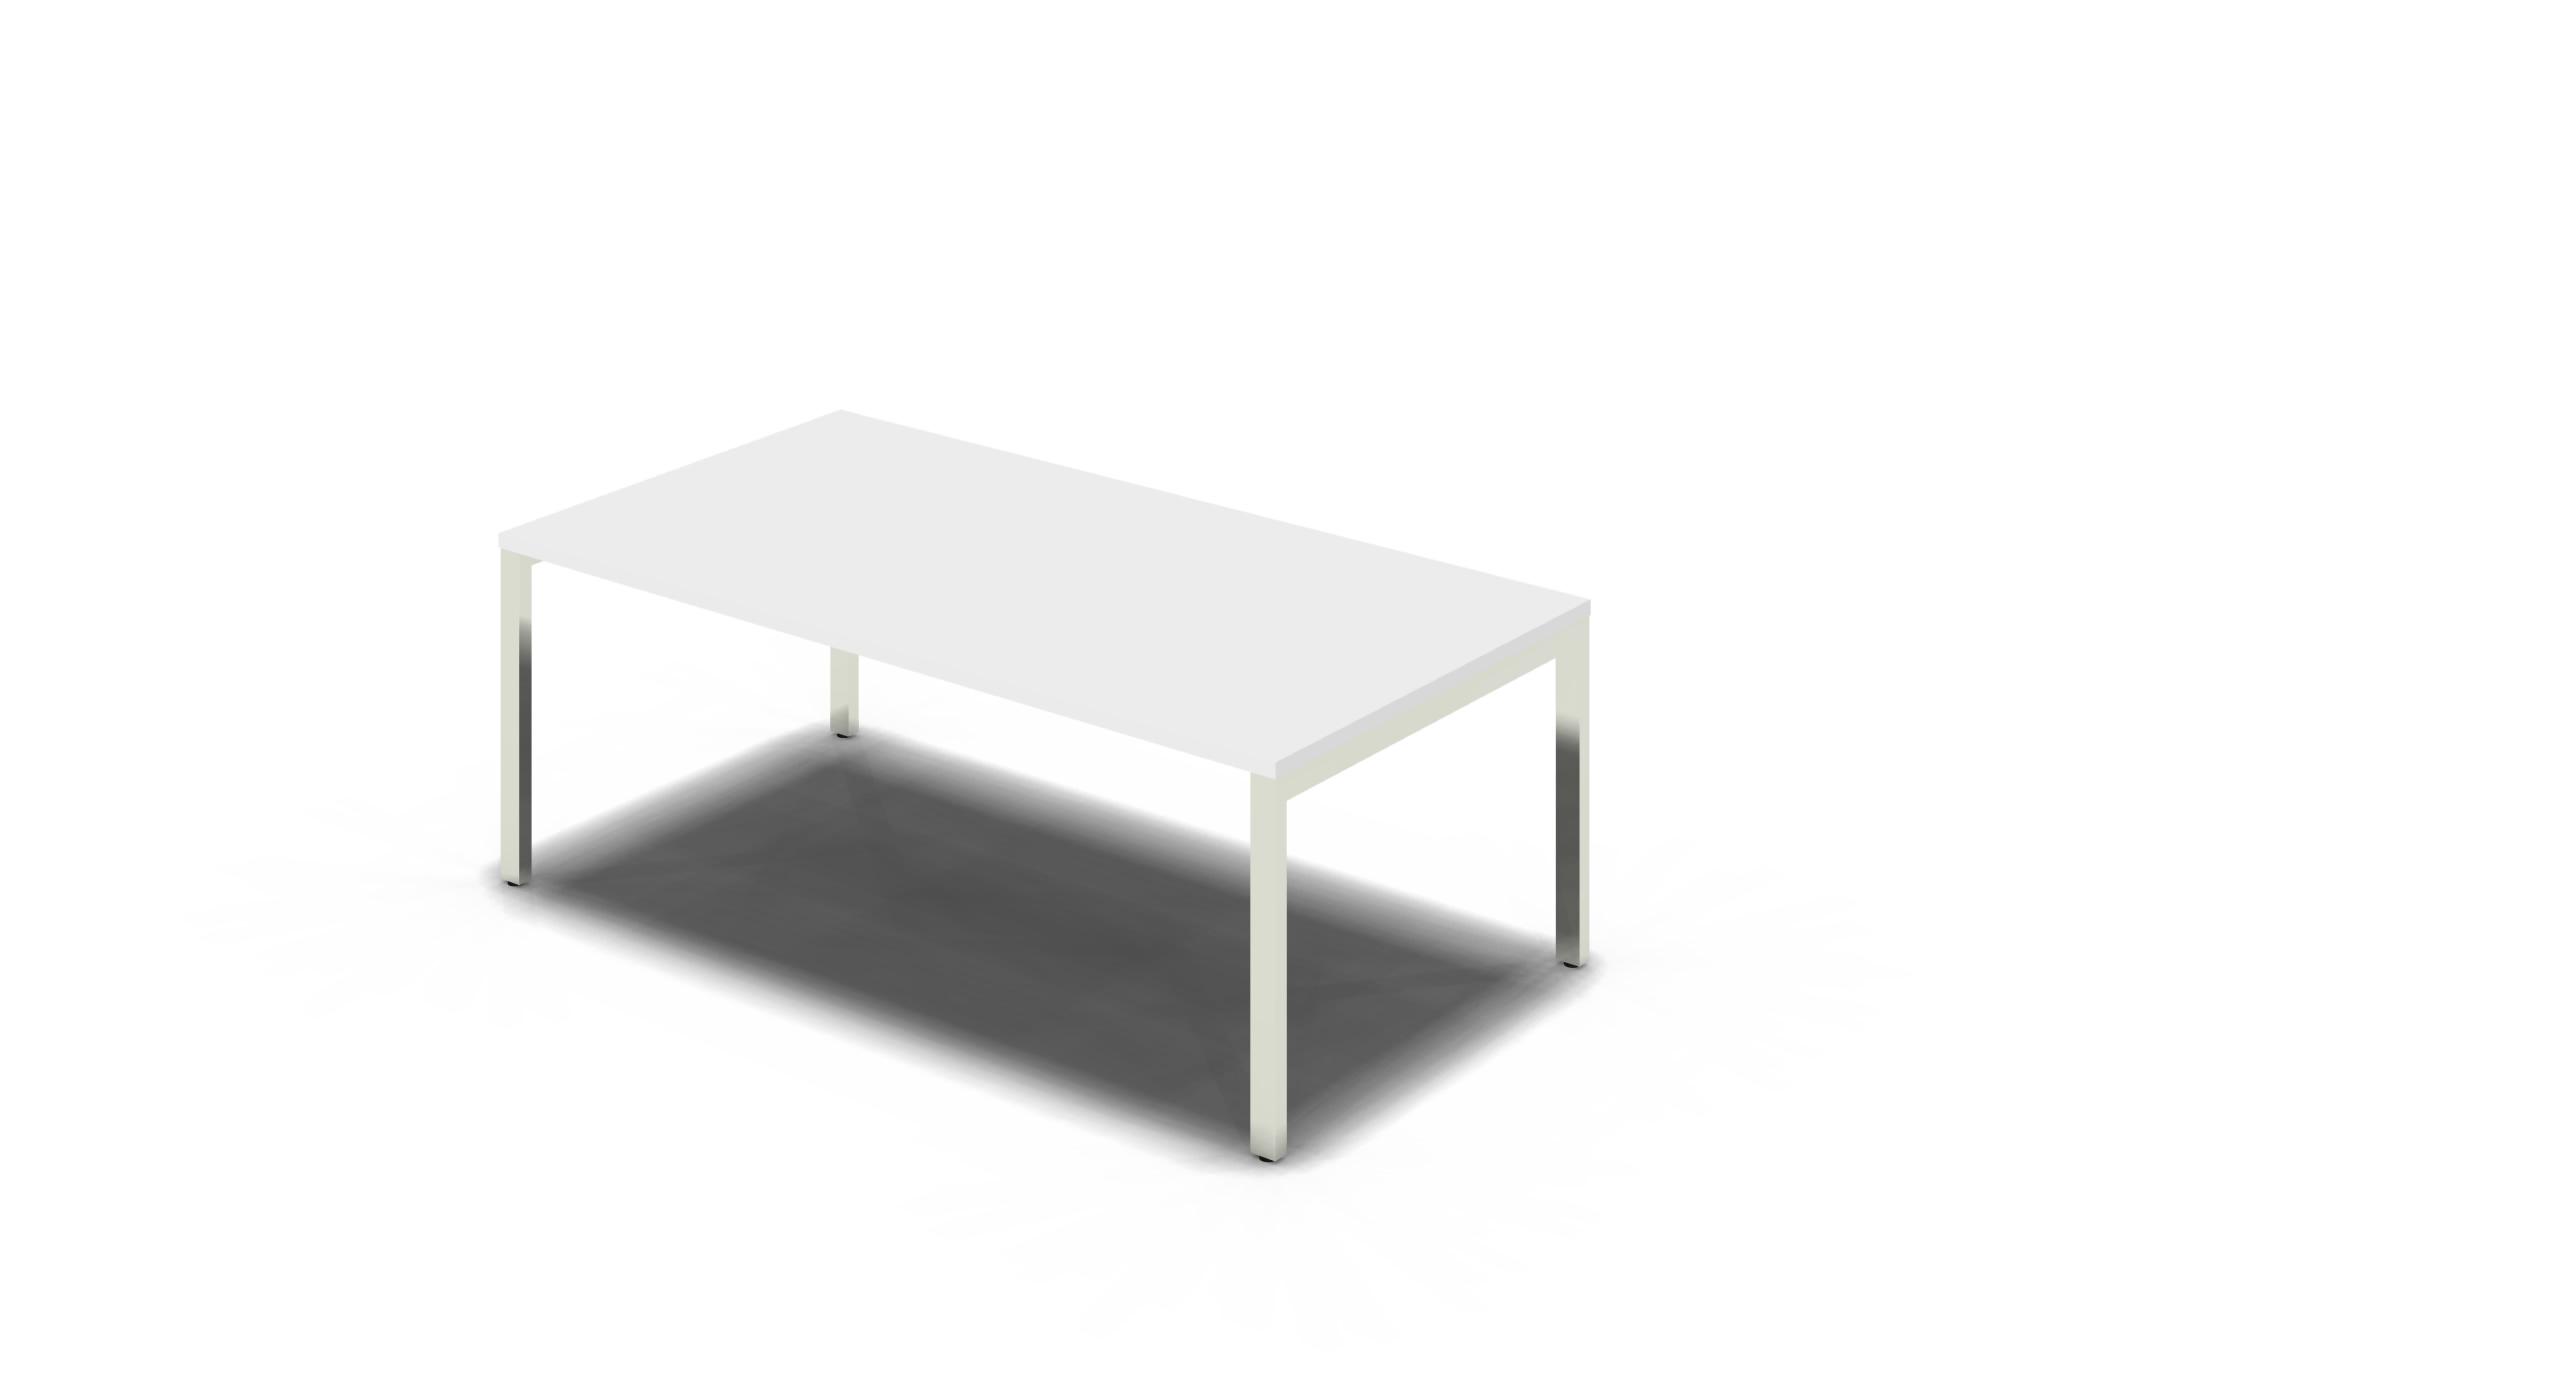 Table_Square_1800x900_Chrome_White_noOption